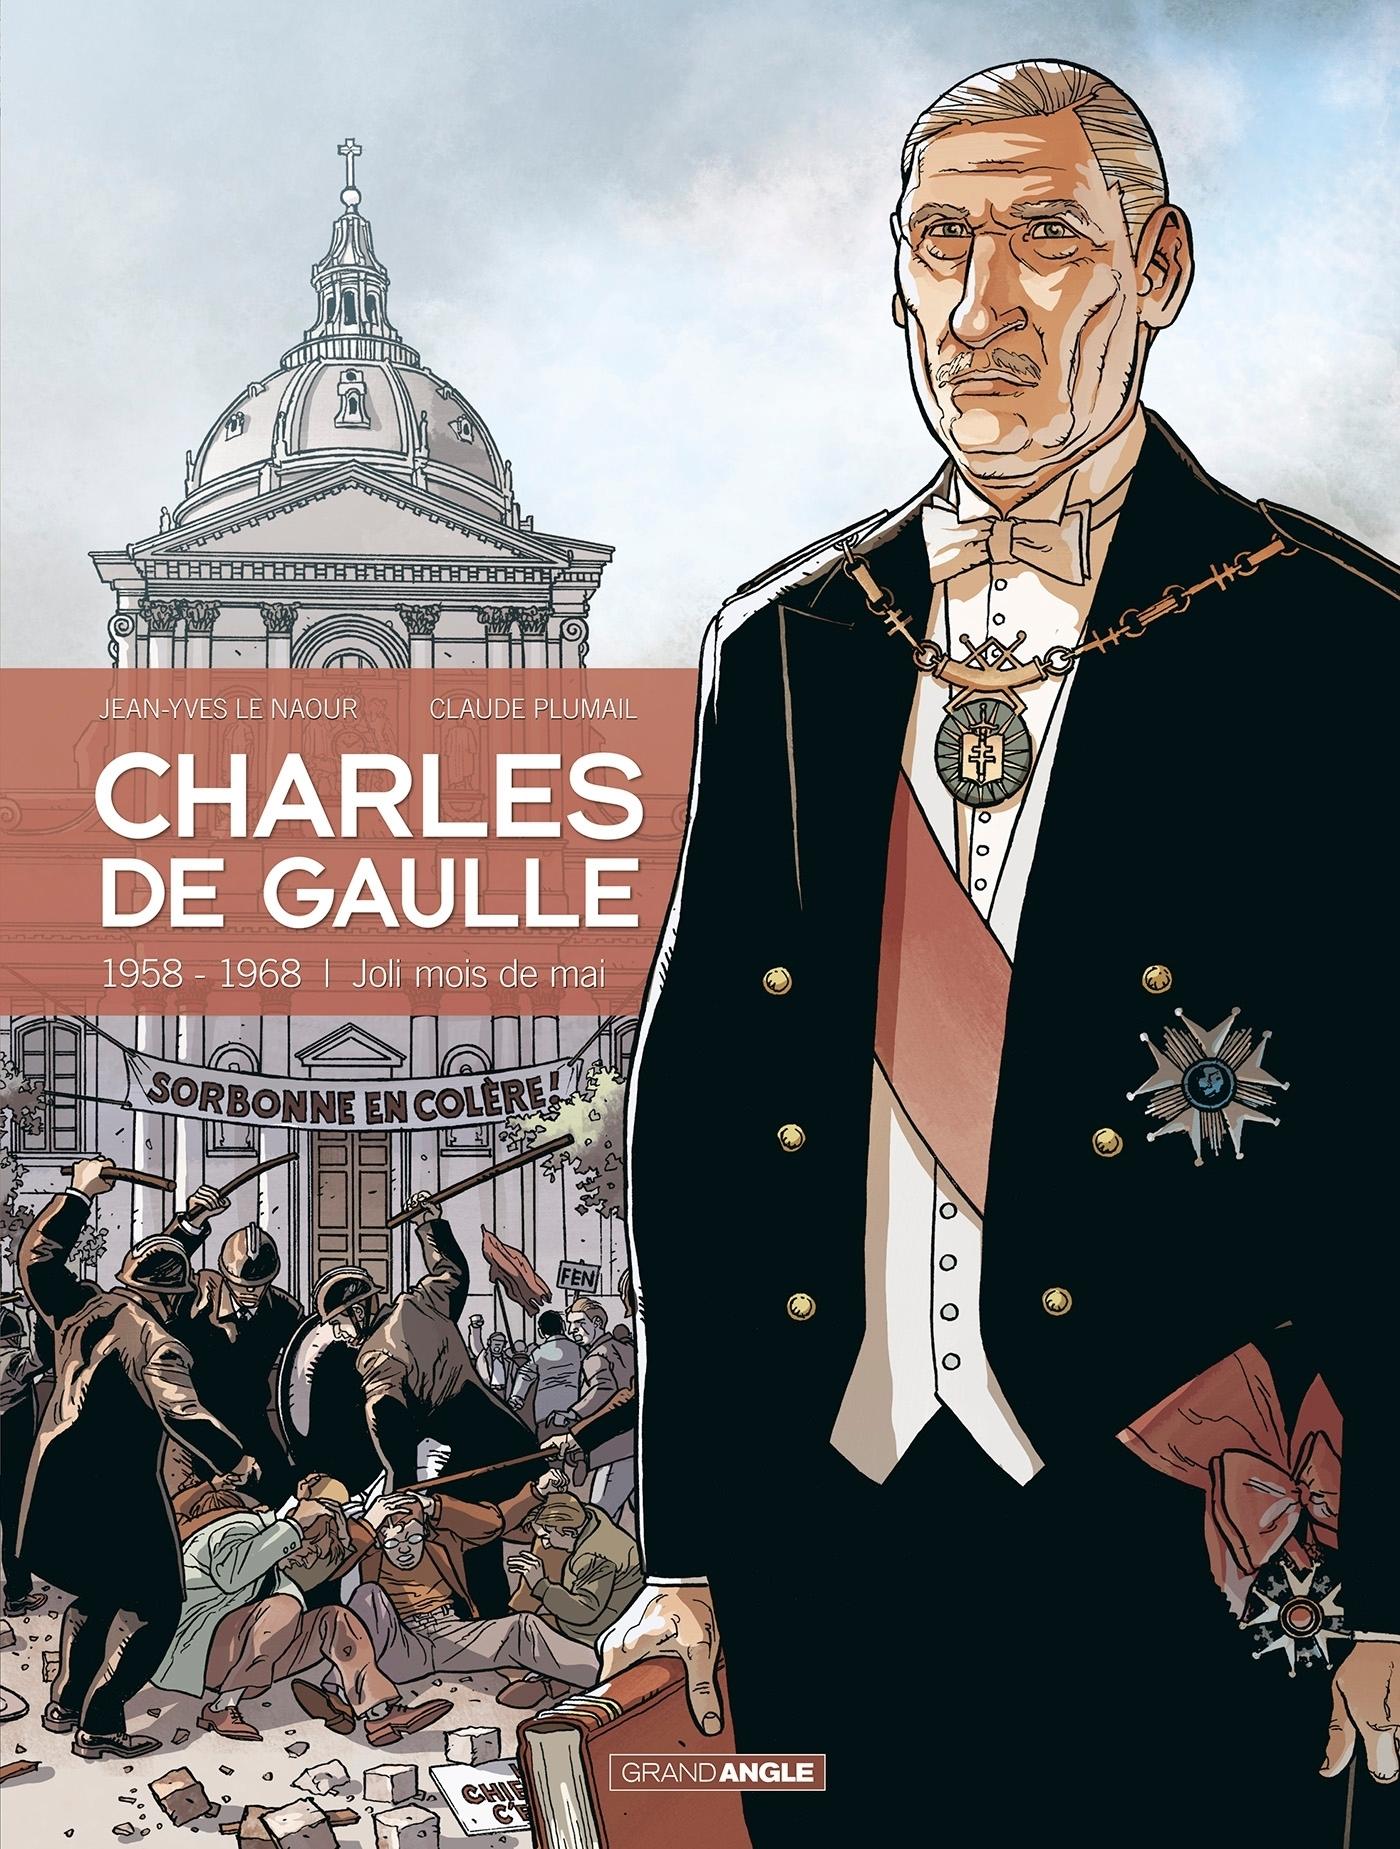 CHARLES DE GAULLE - VOLUME 4 - 1958 - 1968 JOLI MOIS DE MAI